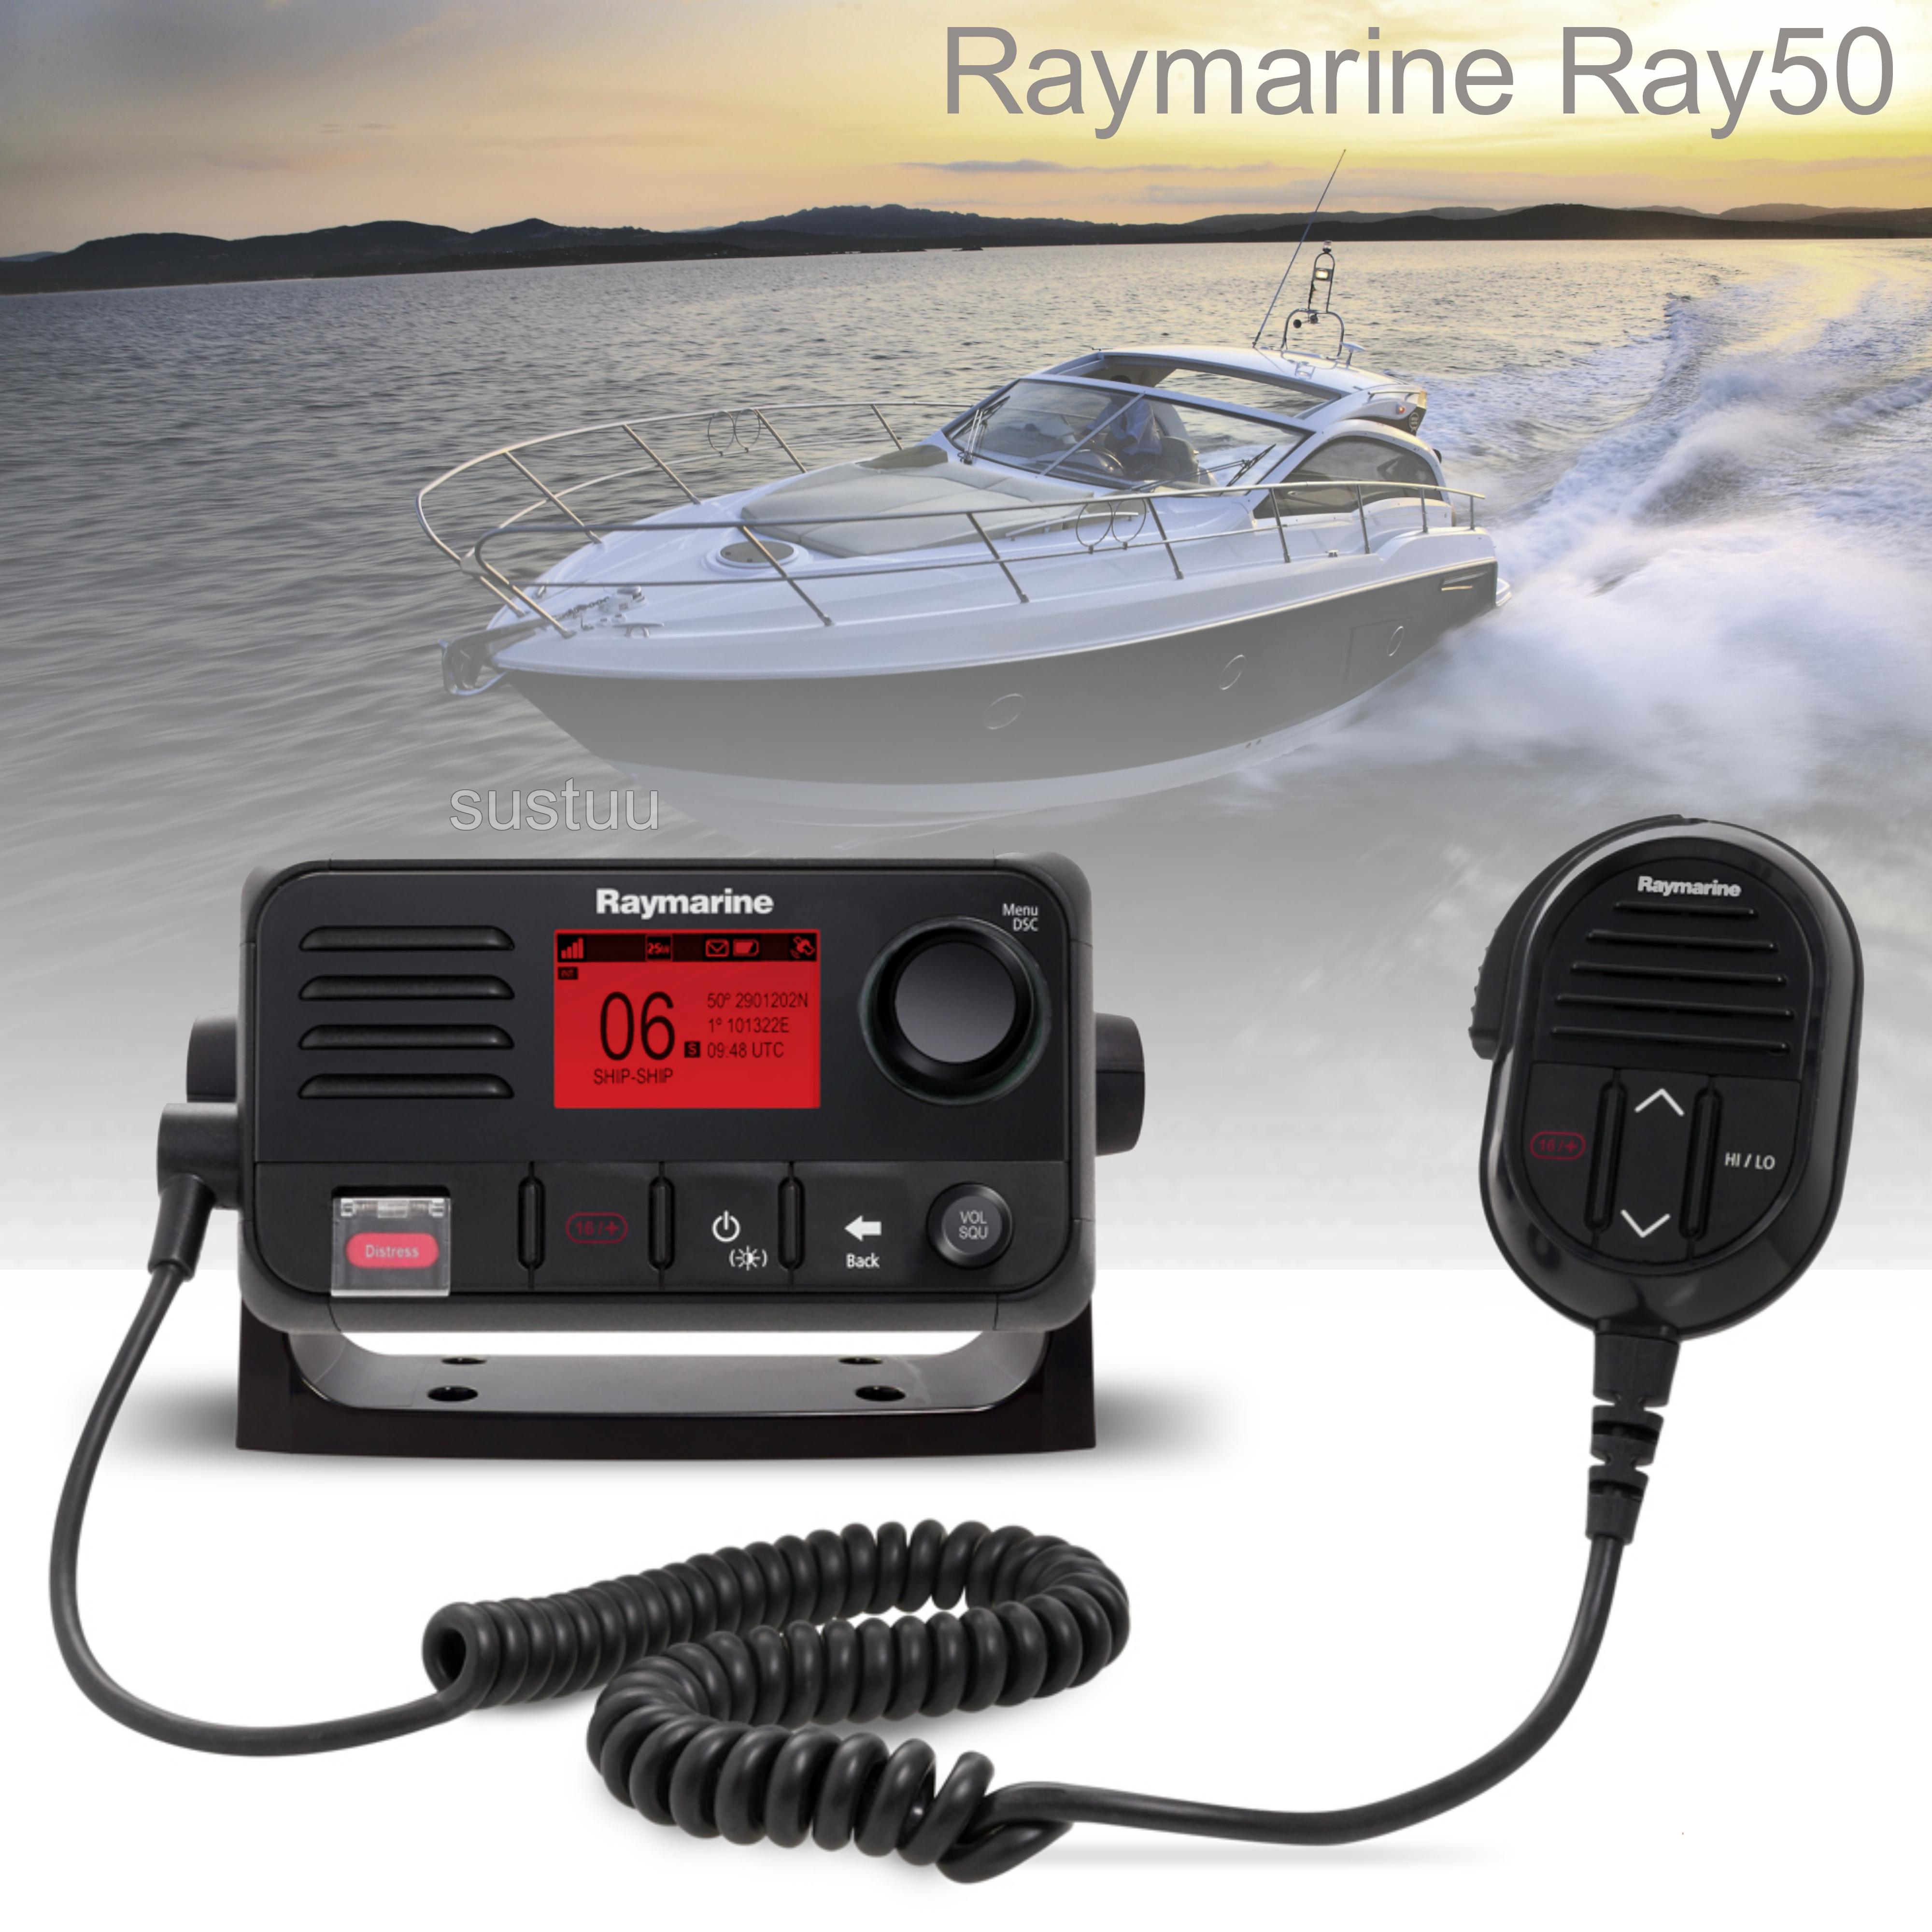 Raymarine E70243 Ray50 Compact Marine VHF Radio 25W Class D DSC LCD Sleek-Black